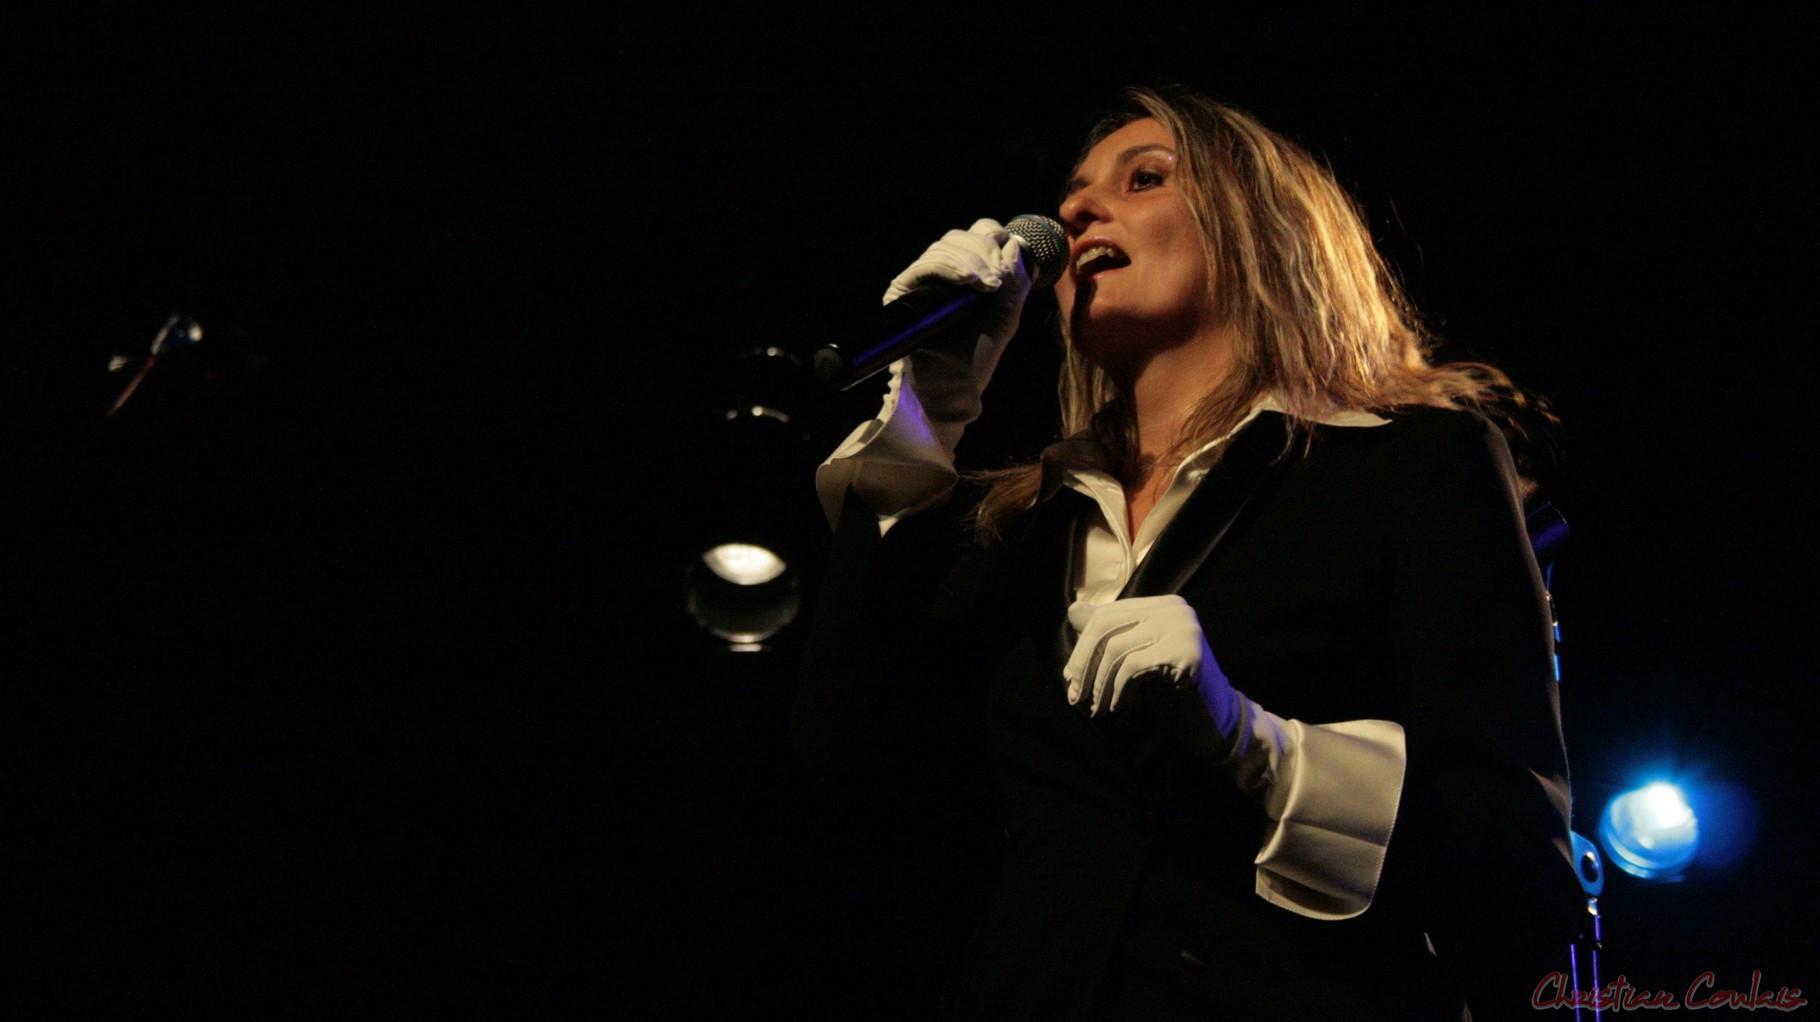 Festival JAZZ360 2010, Lo Jay & Serge Moulinier Trio, Cénac